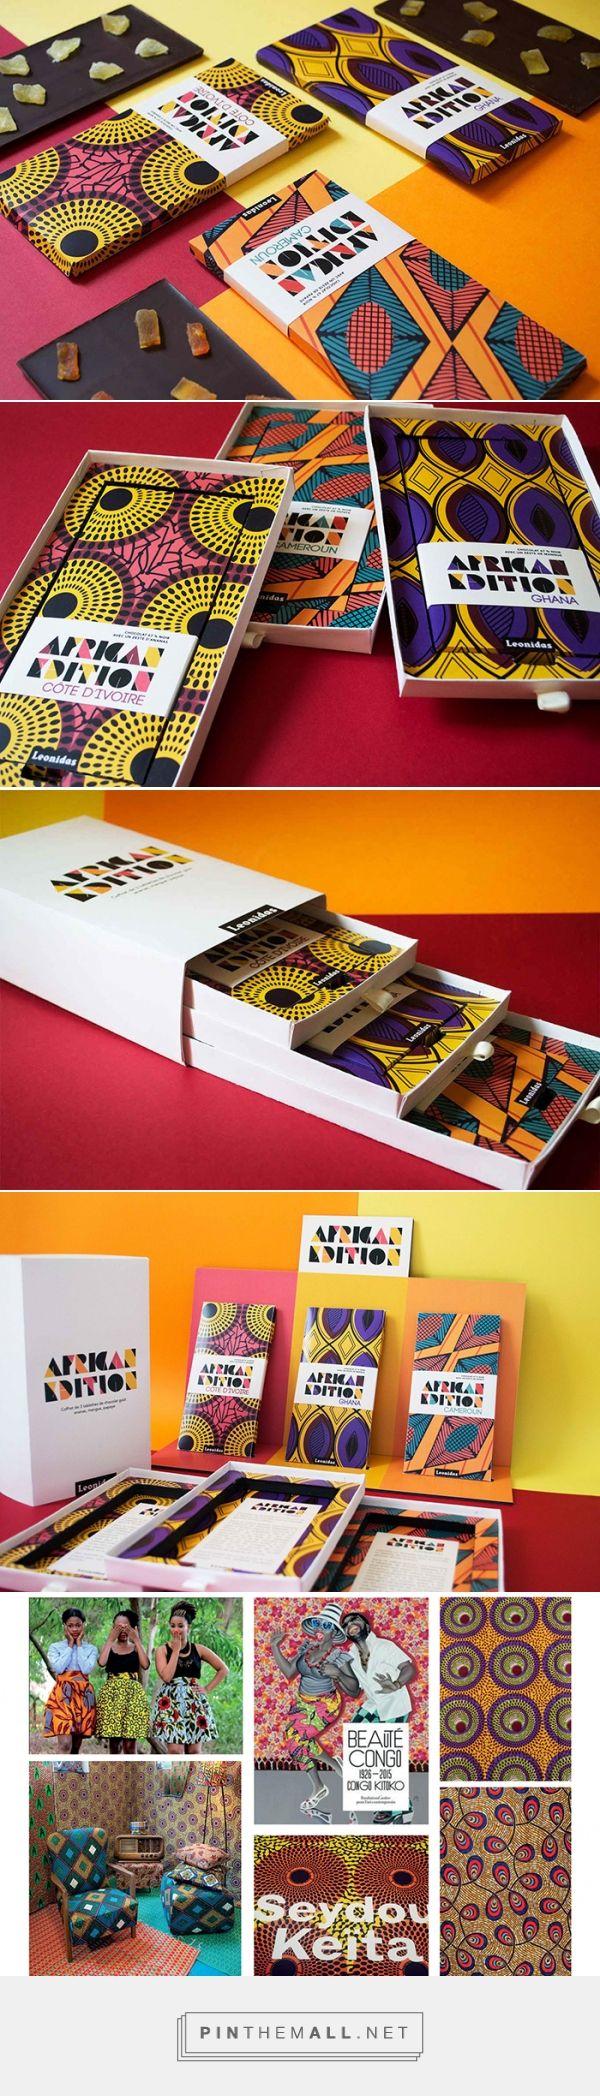 African Edition / Designed by Emma Thibault